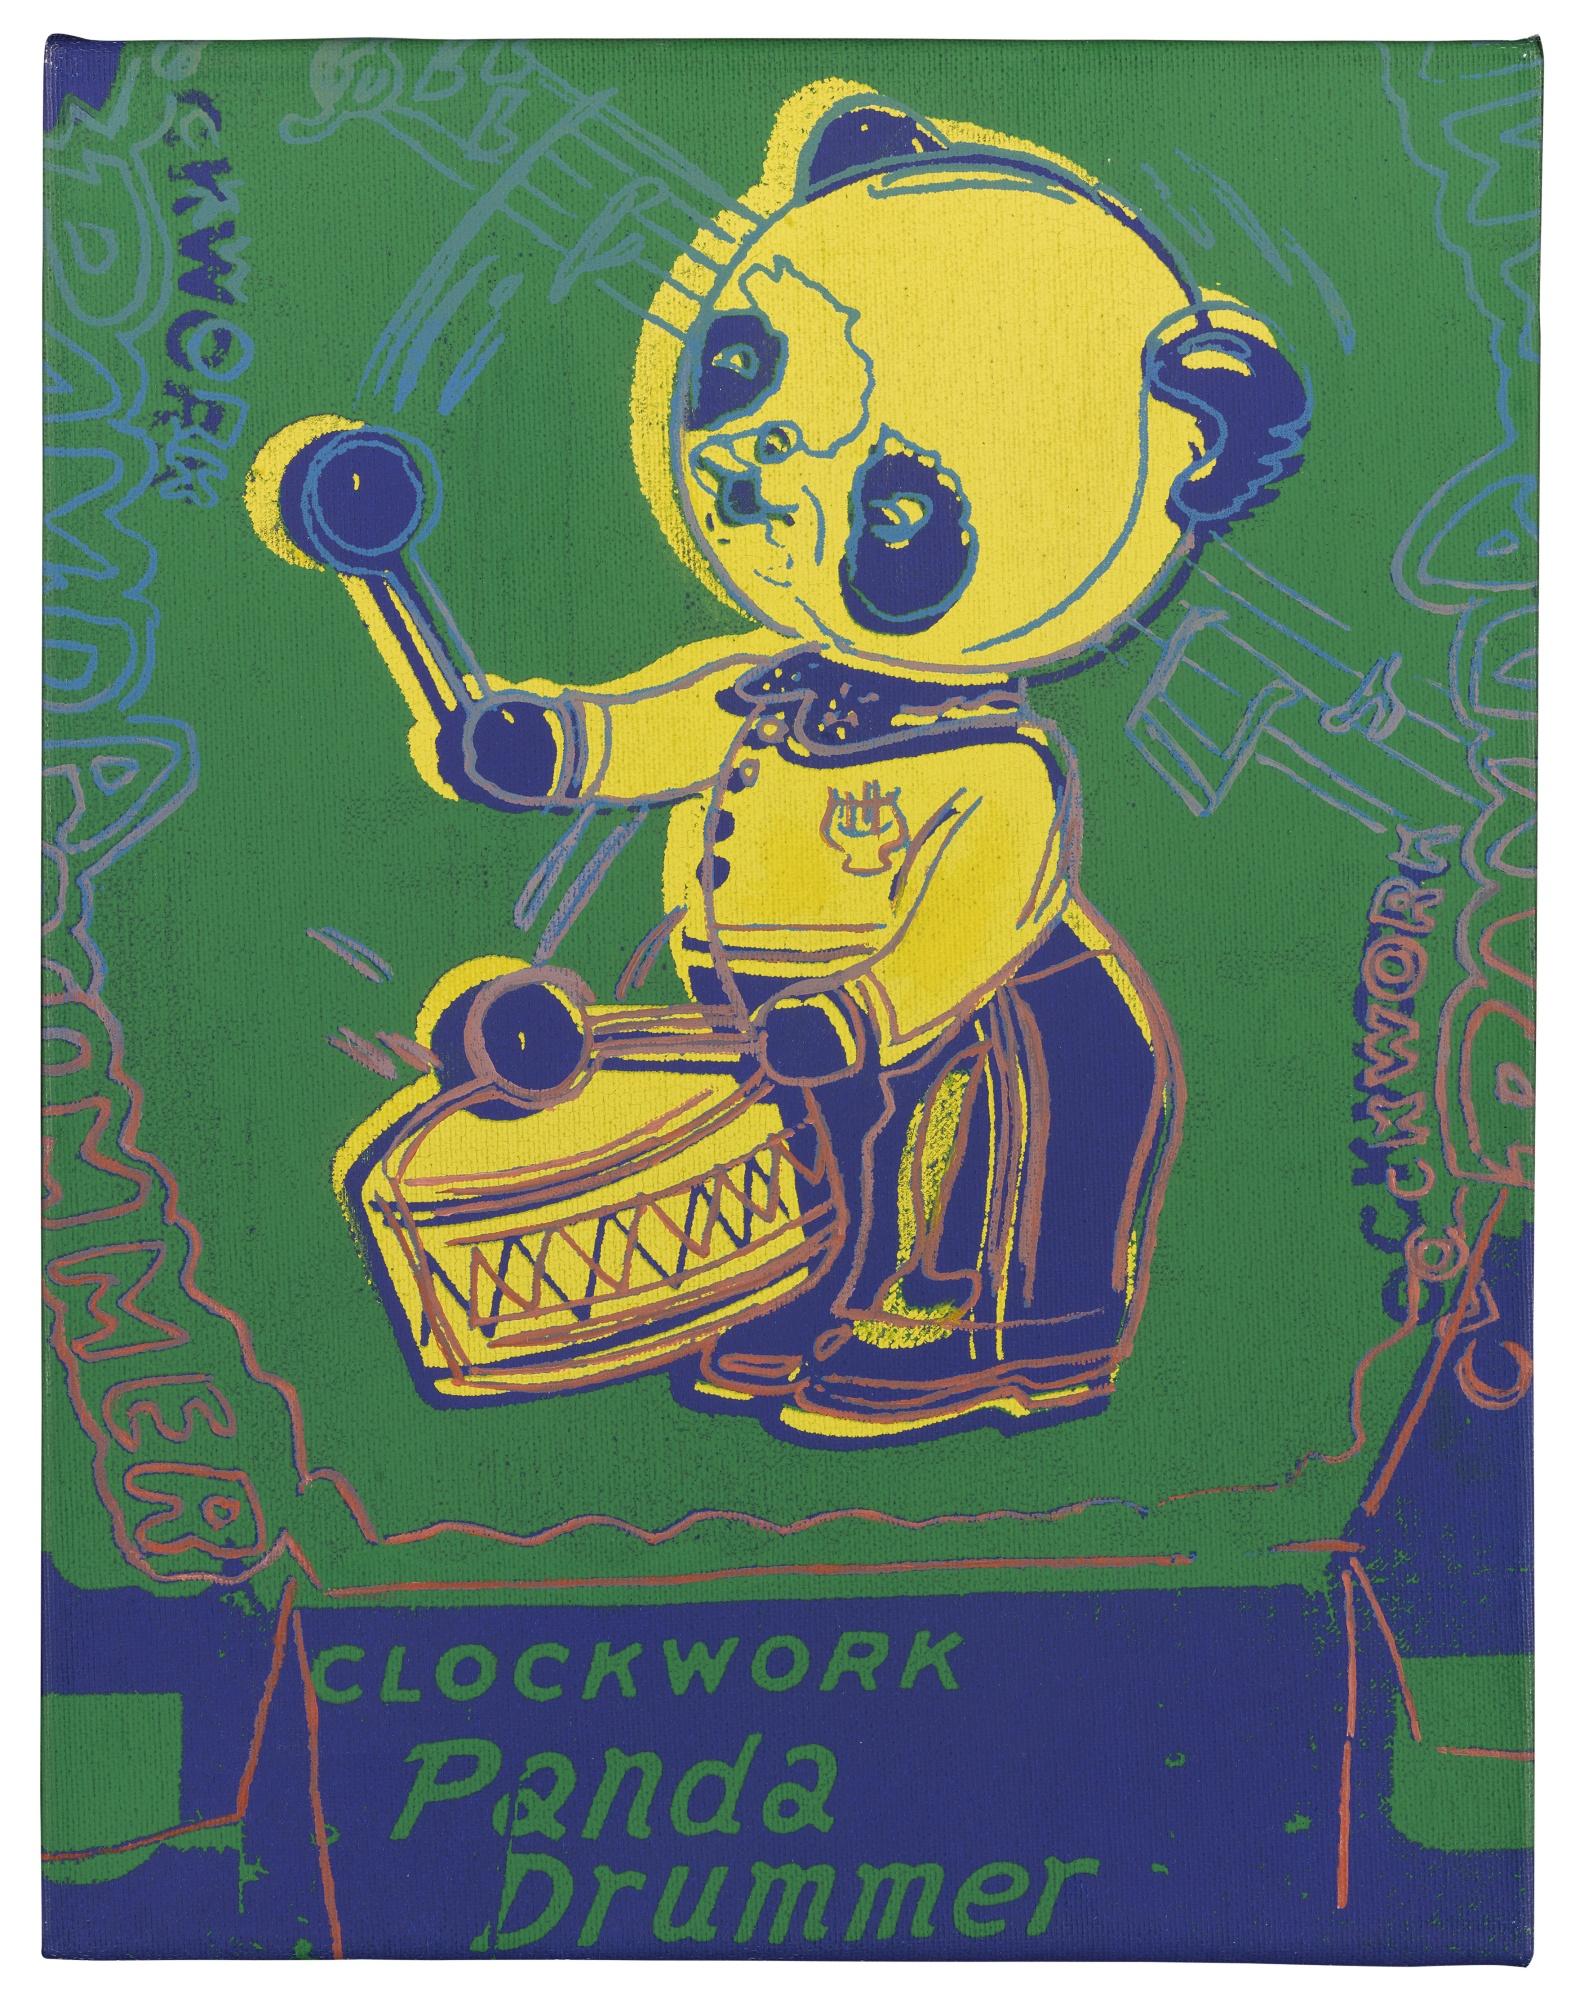 Andy Warhol-Clockwork Panda Drummer (Toy Painting)-1983